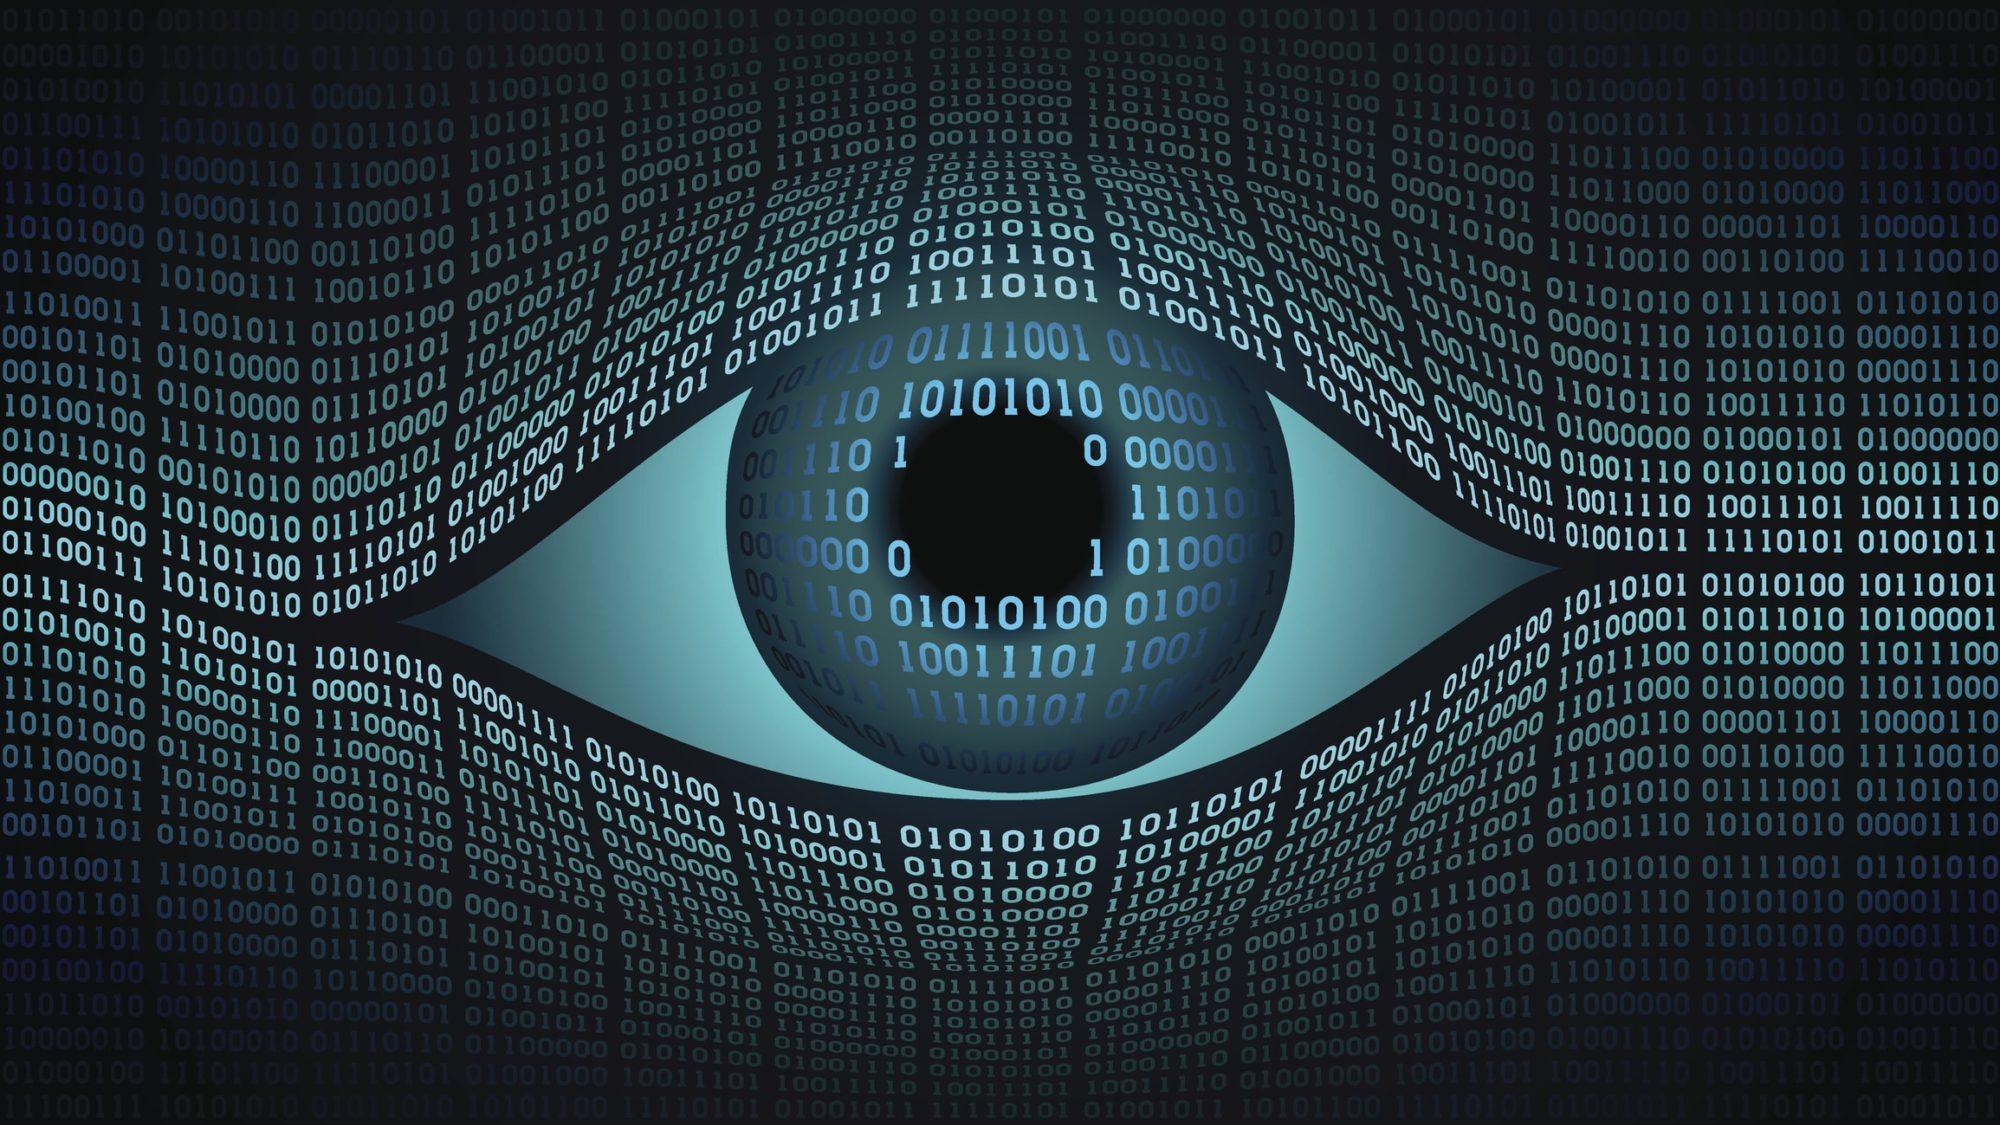 Personalberatung Vertrieb - Datenschutz-Auge